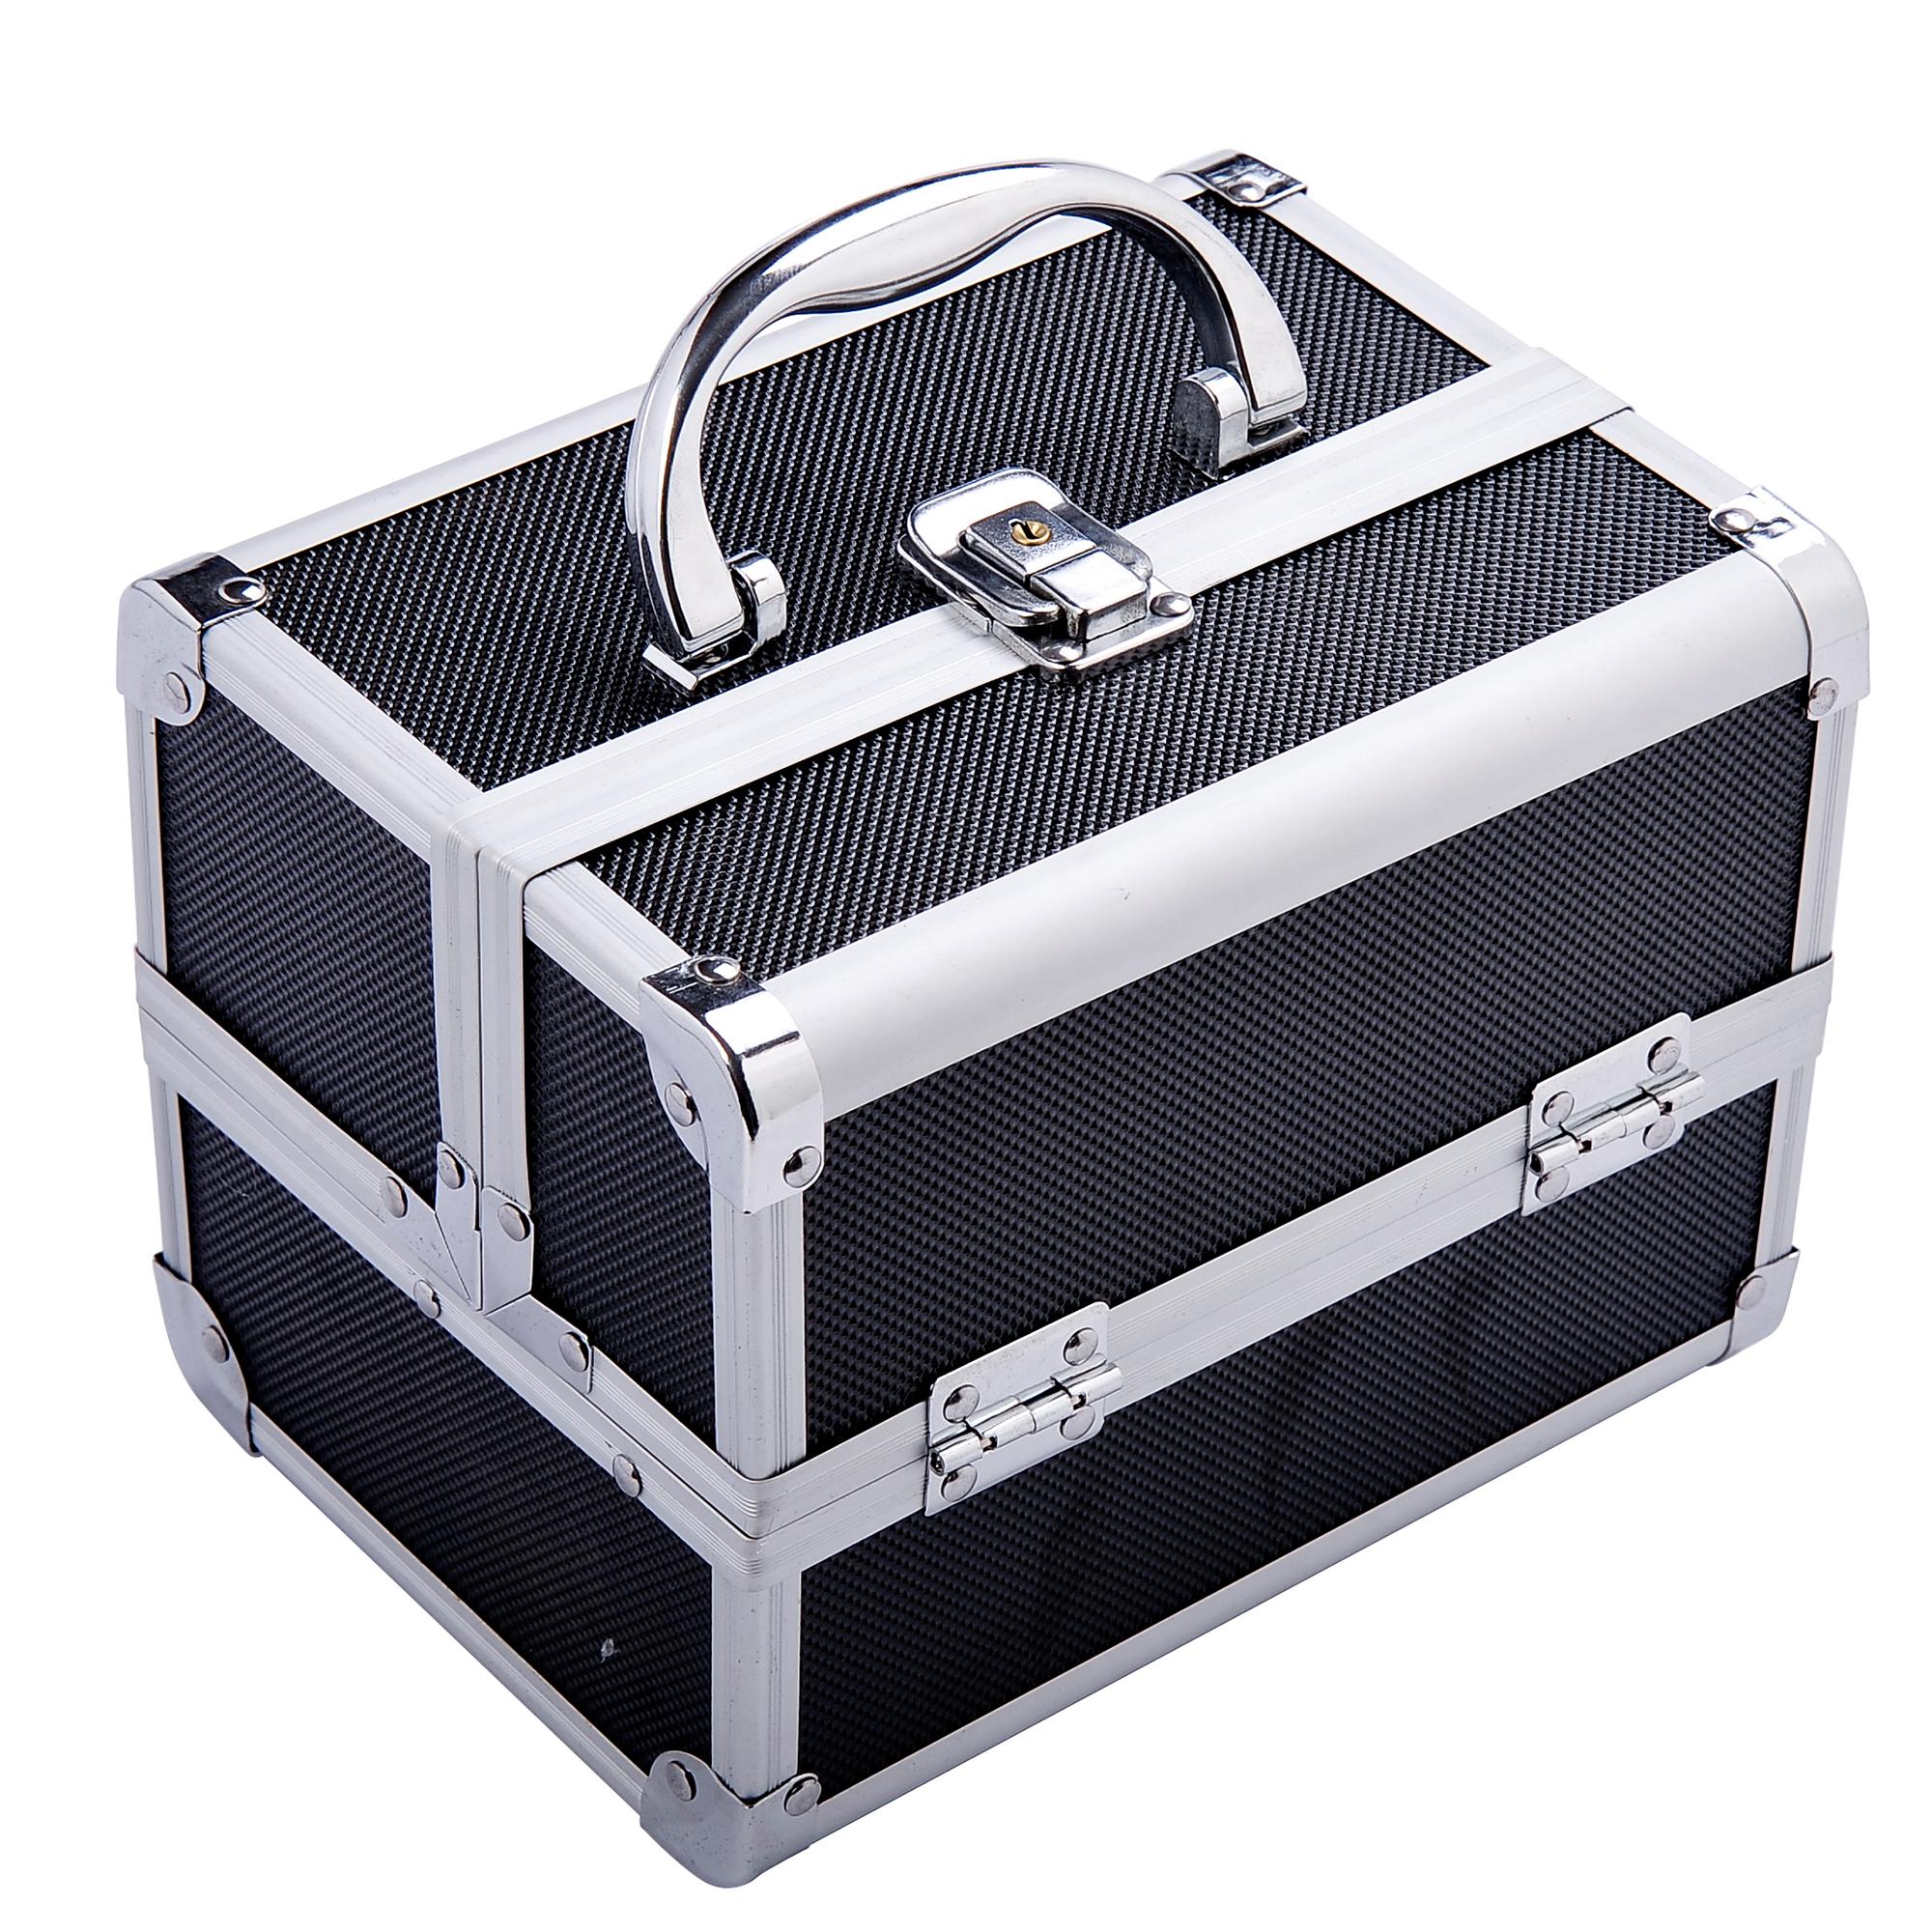 Aluminum-Rolling-Makeup-Train-Case-Trolley-Organizer-Storage-Box-Lockable thumbnail 24